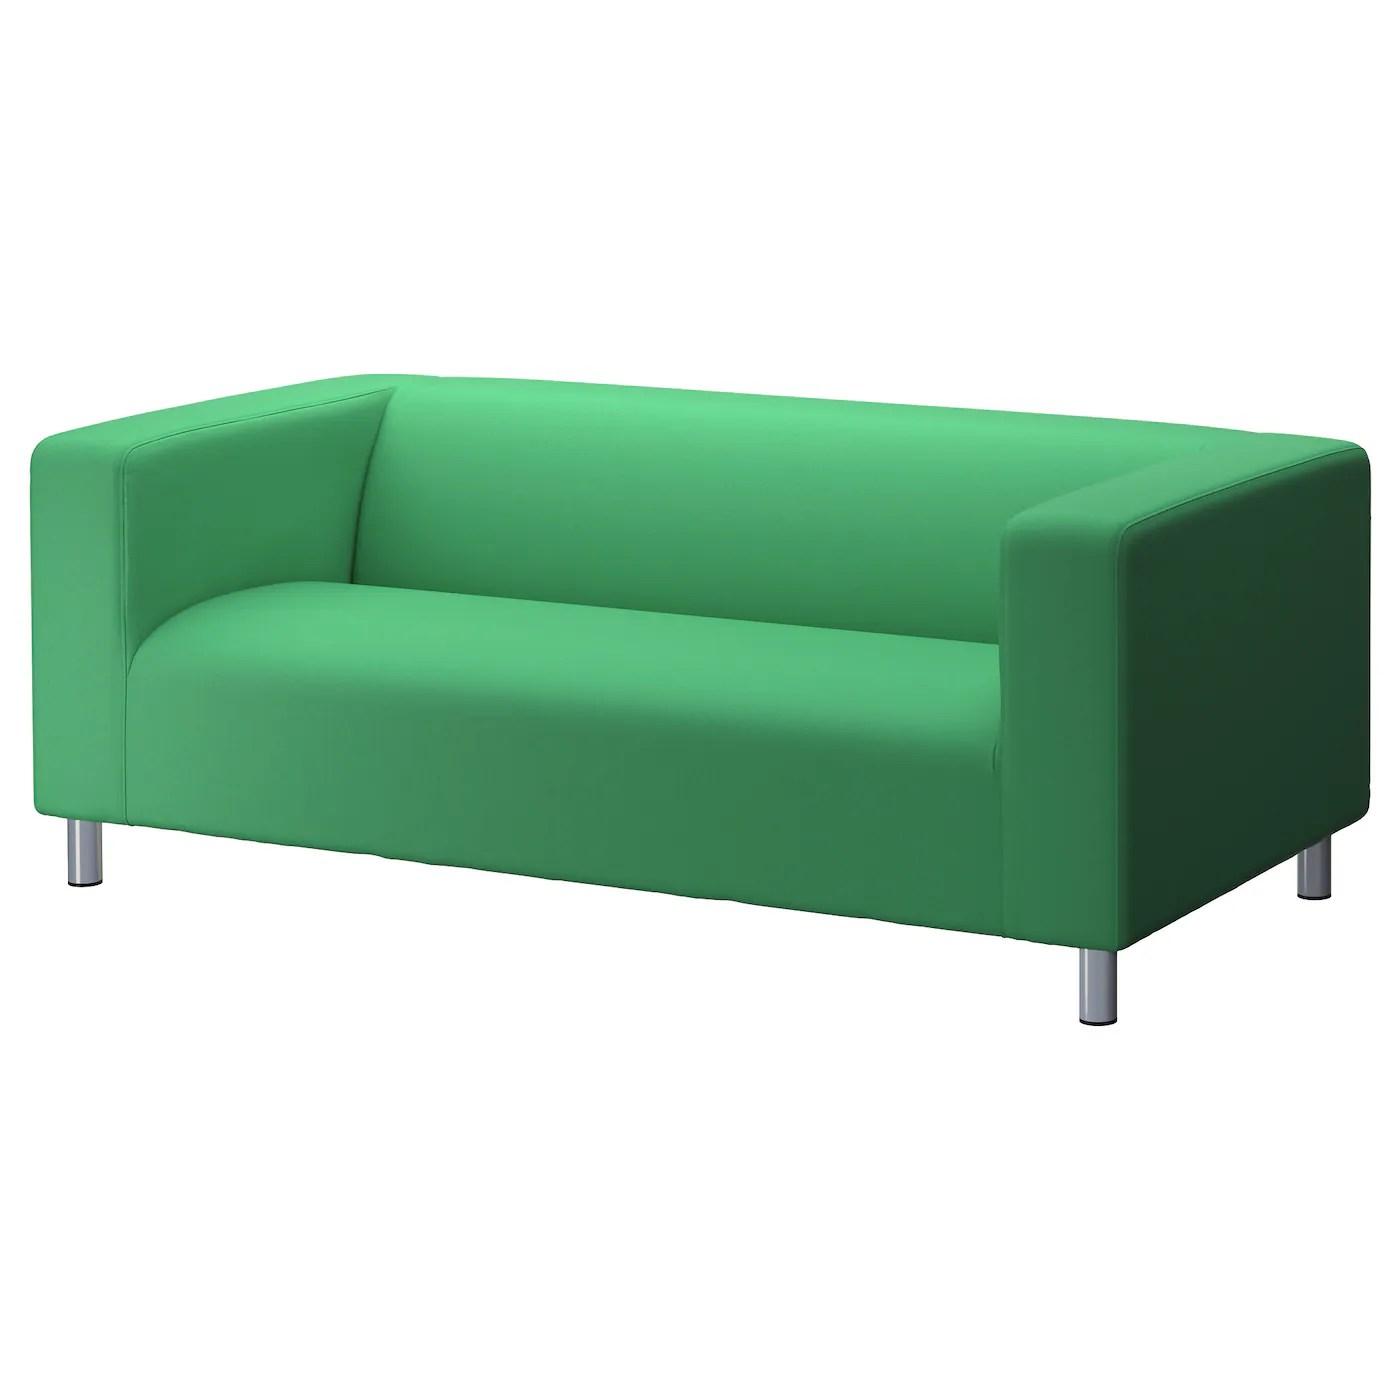 ikea klippan sofa cover red verona leather two-seat flackarp green -